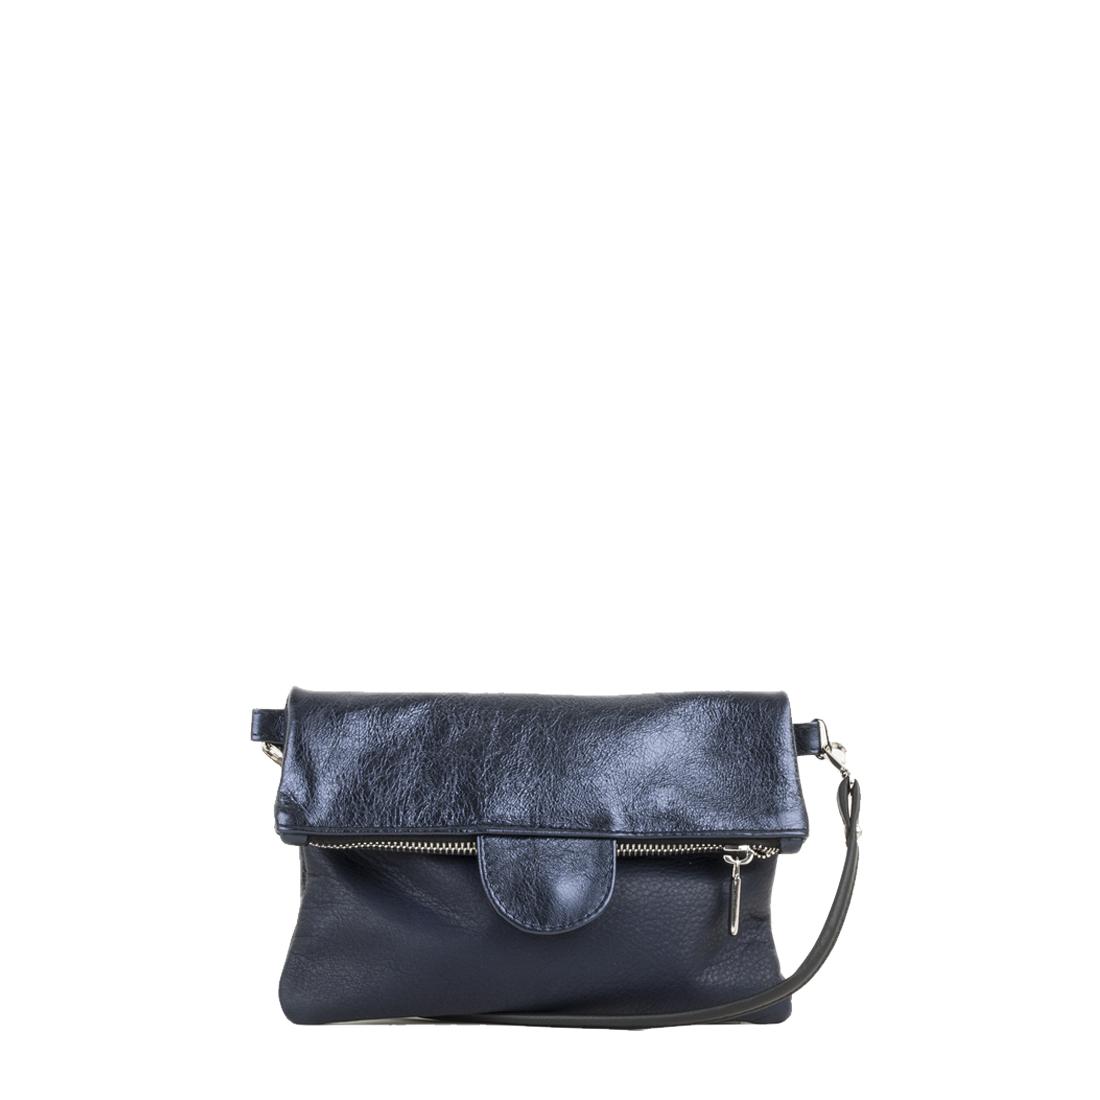 Lilly Navy Metallic Leather Across Body Bag